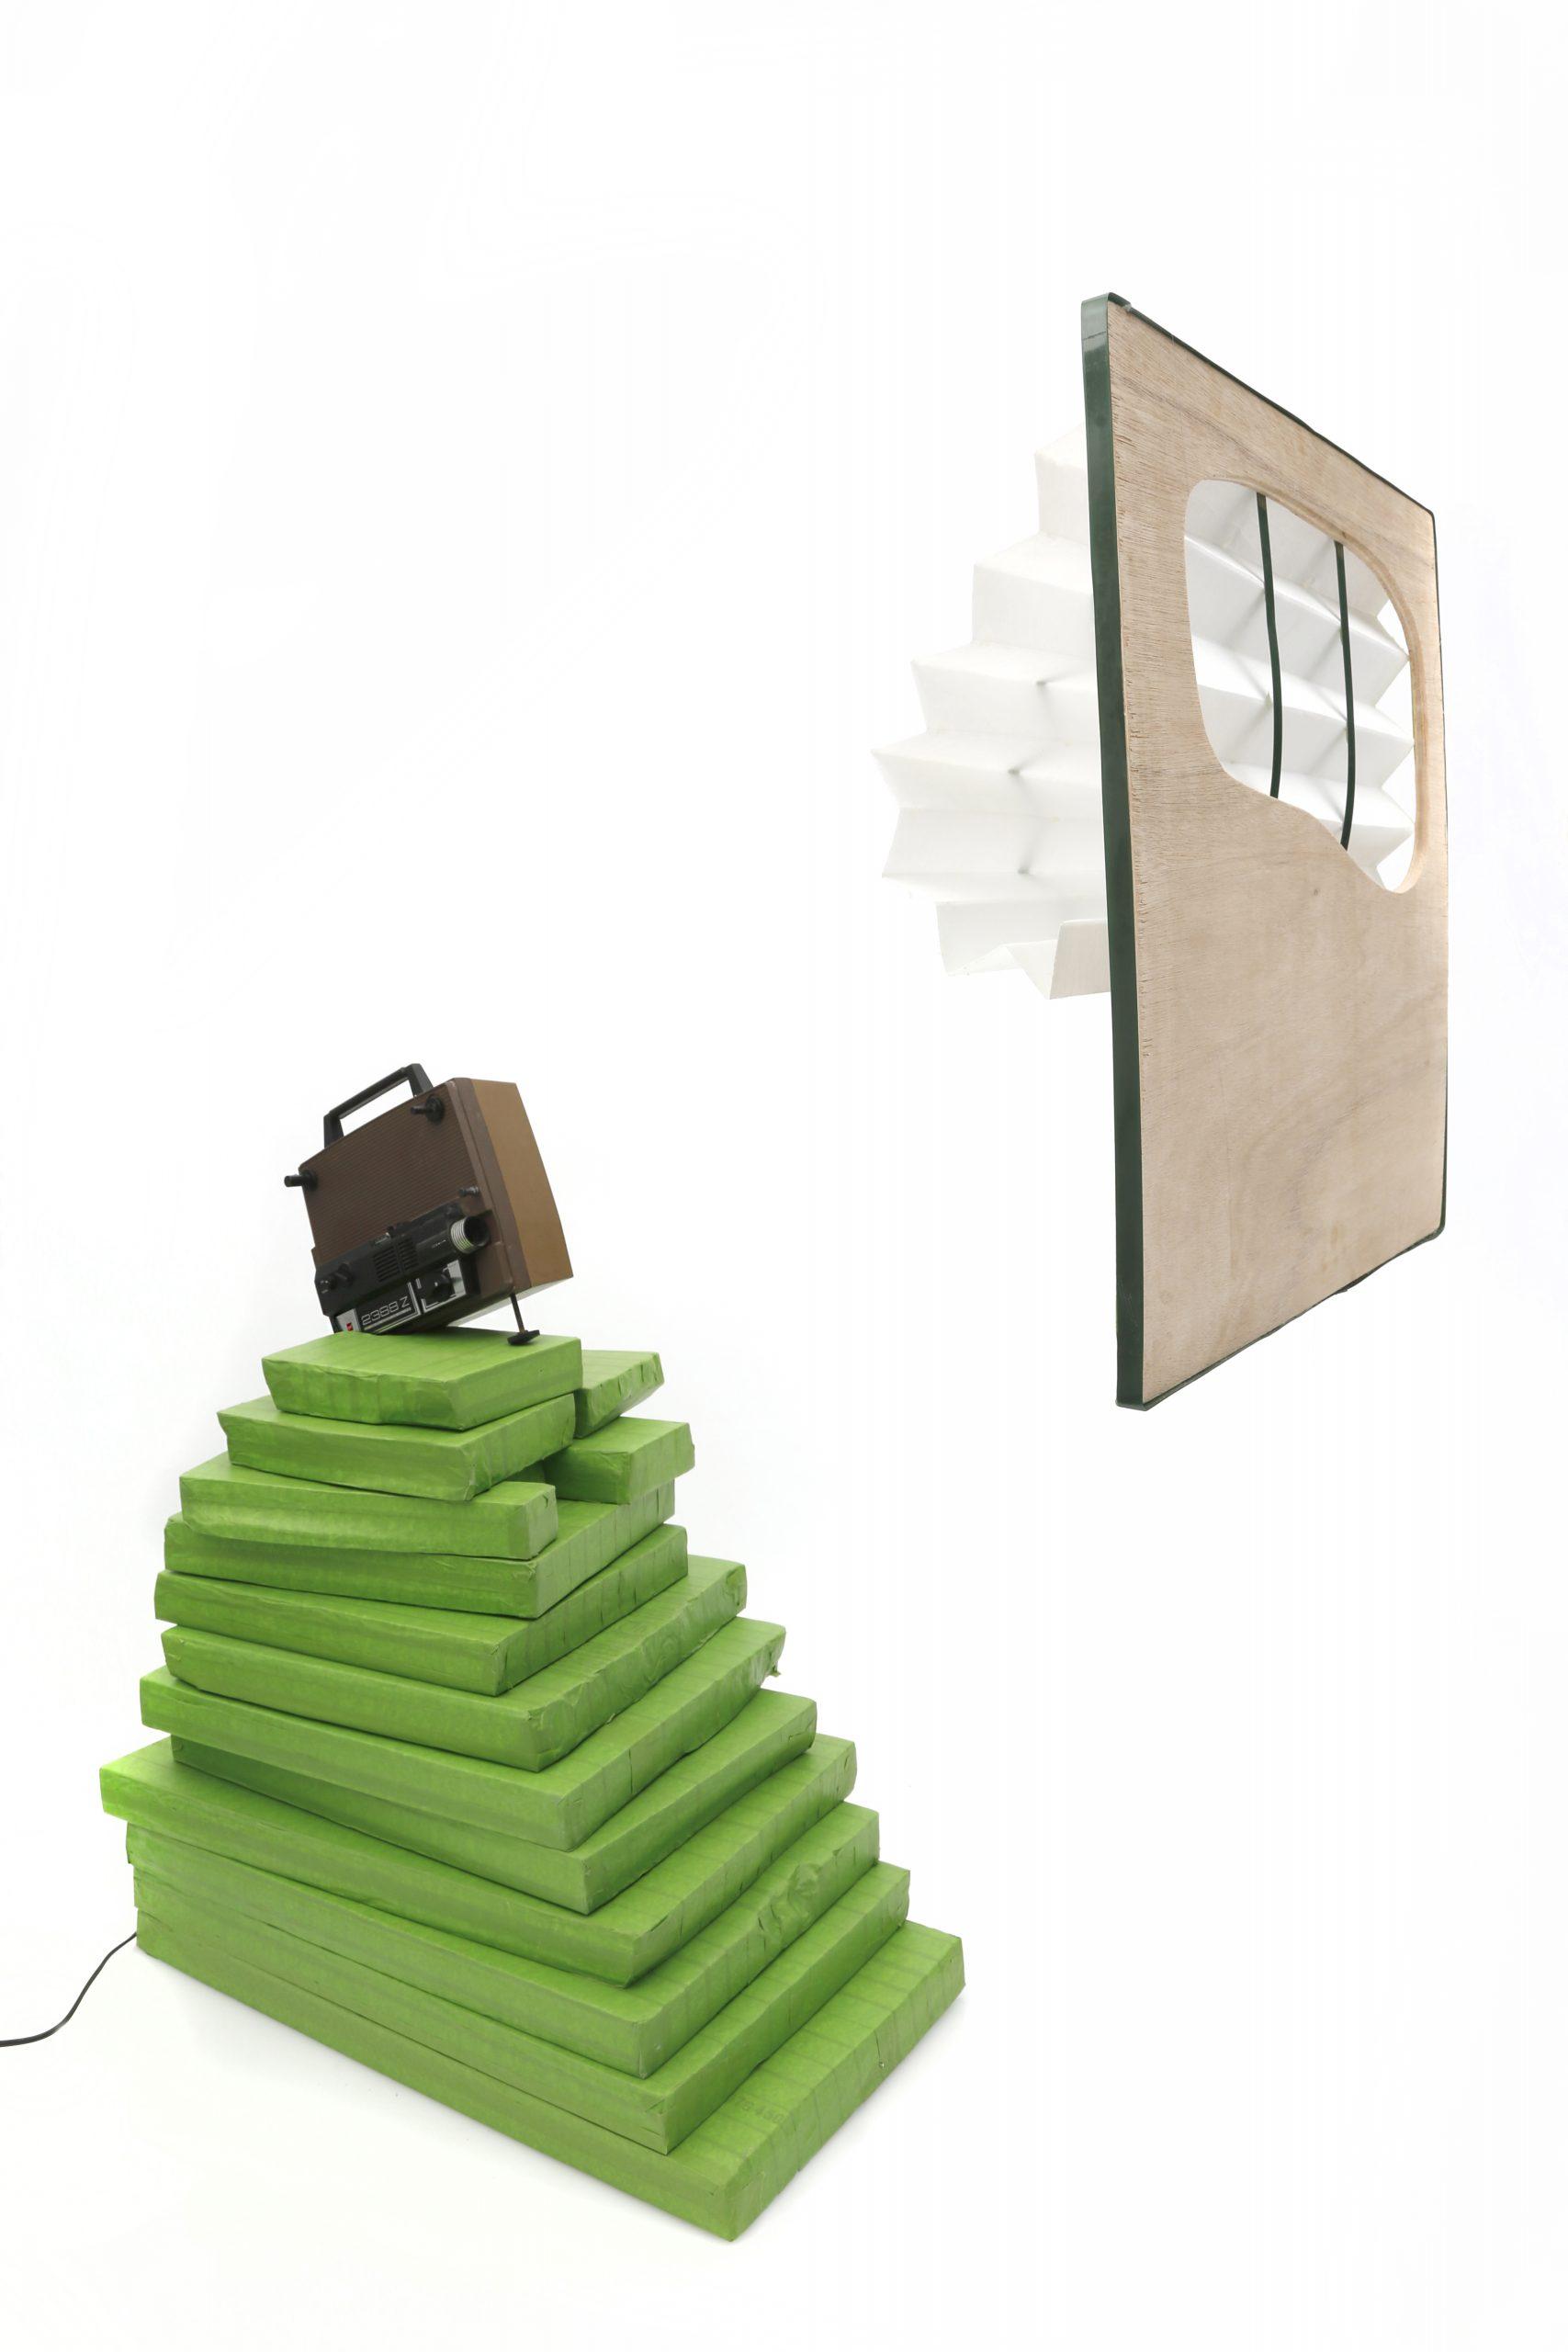 Regina Viqueira, Private Entrance, 2017, frog tape, foam, 8mm projector, wood, air filter, packing belt. Dimensions variable